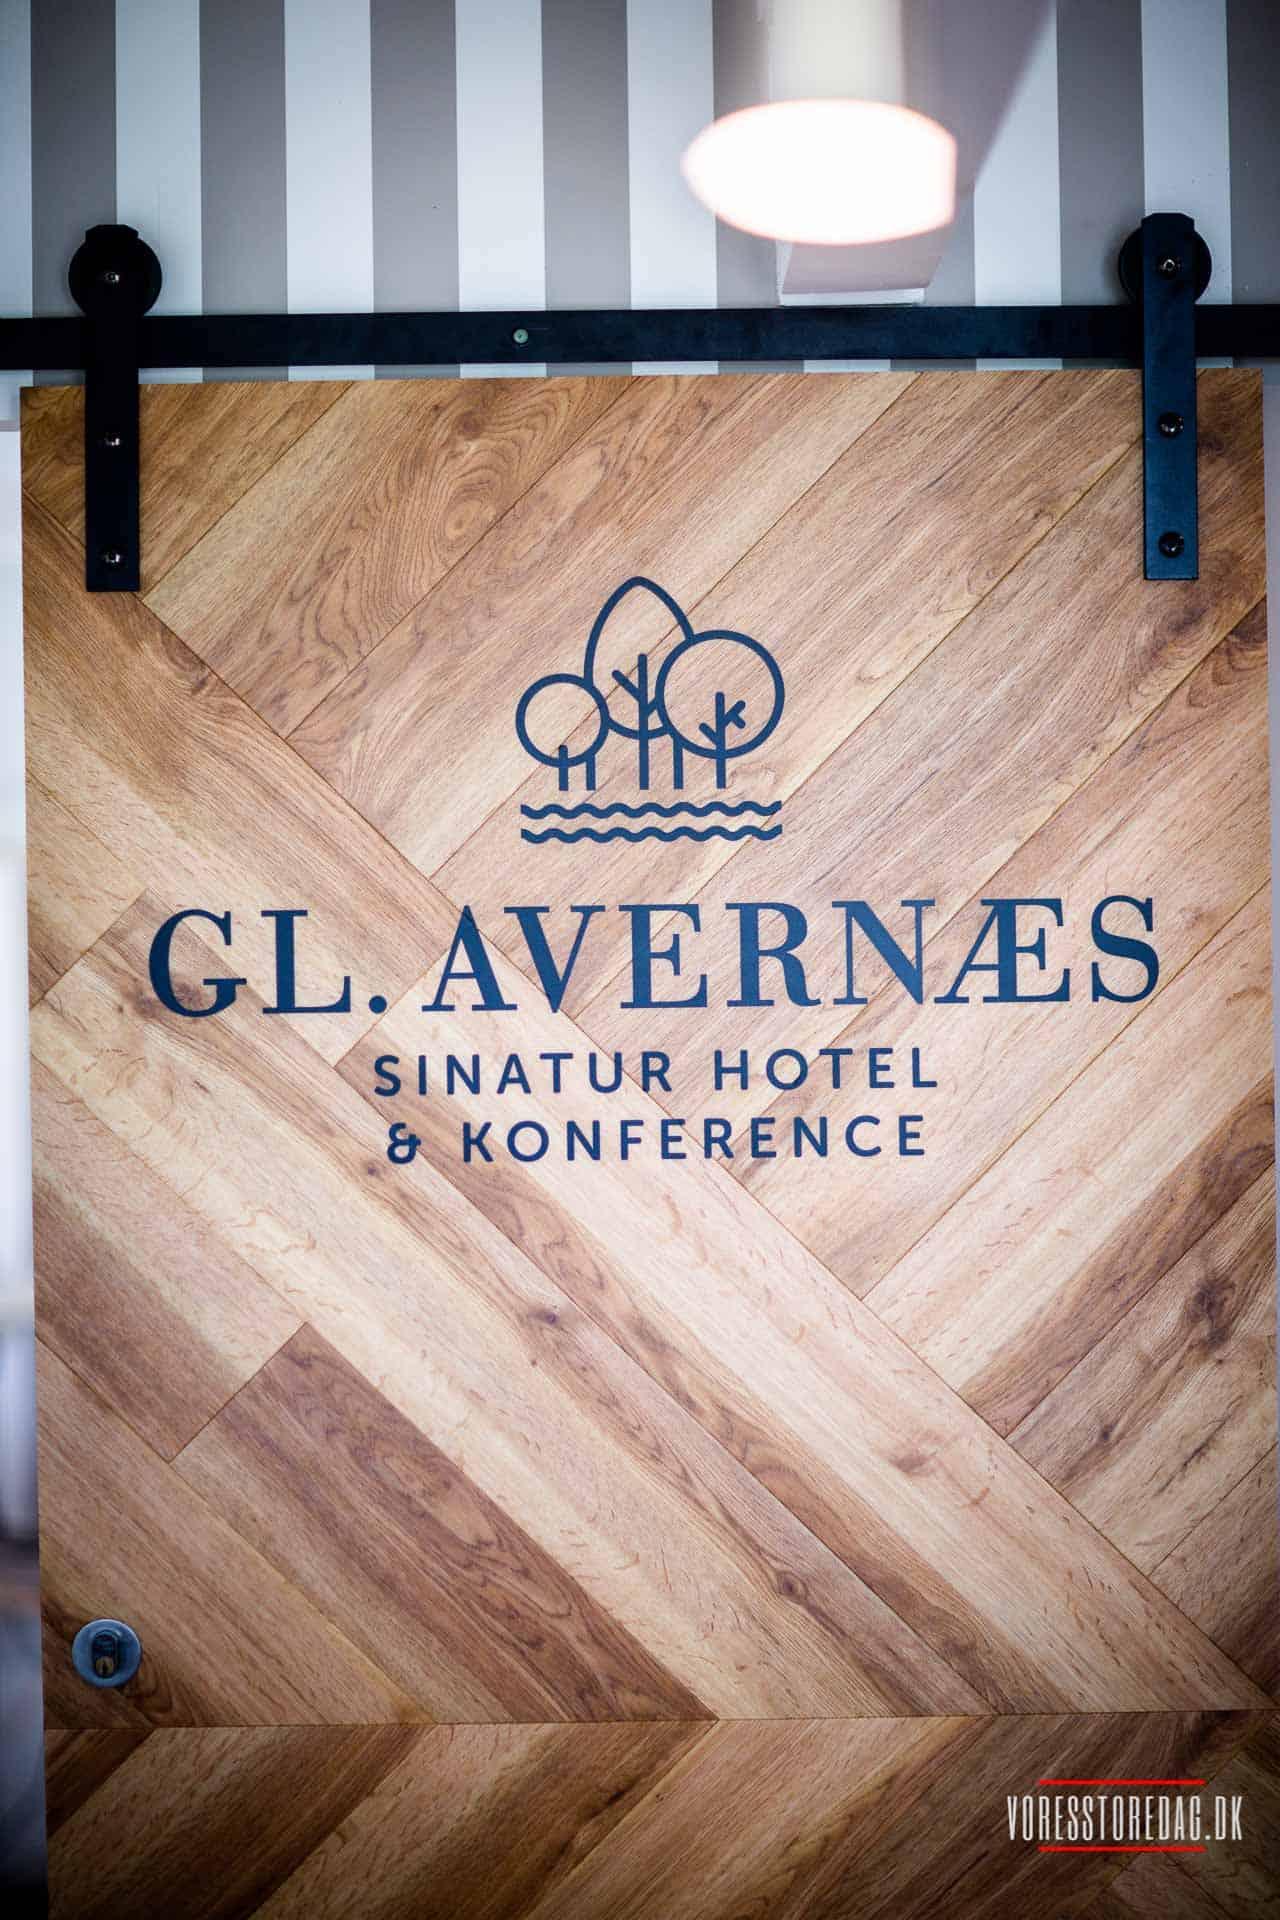 Få en idyllisk spiseoplevelse i restauranten på Gl. Avernæs